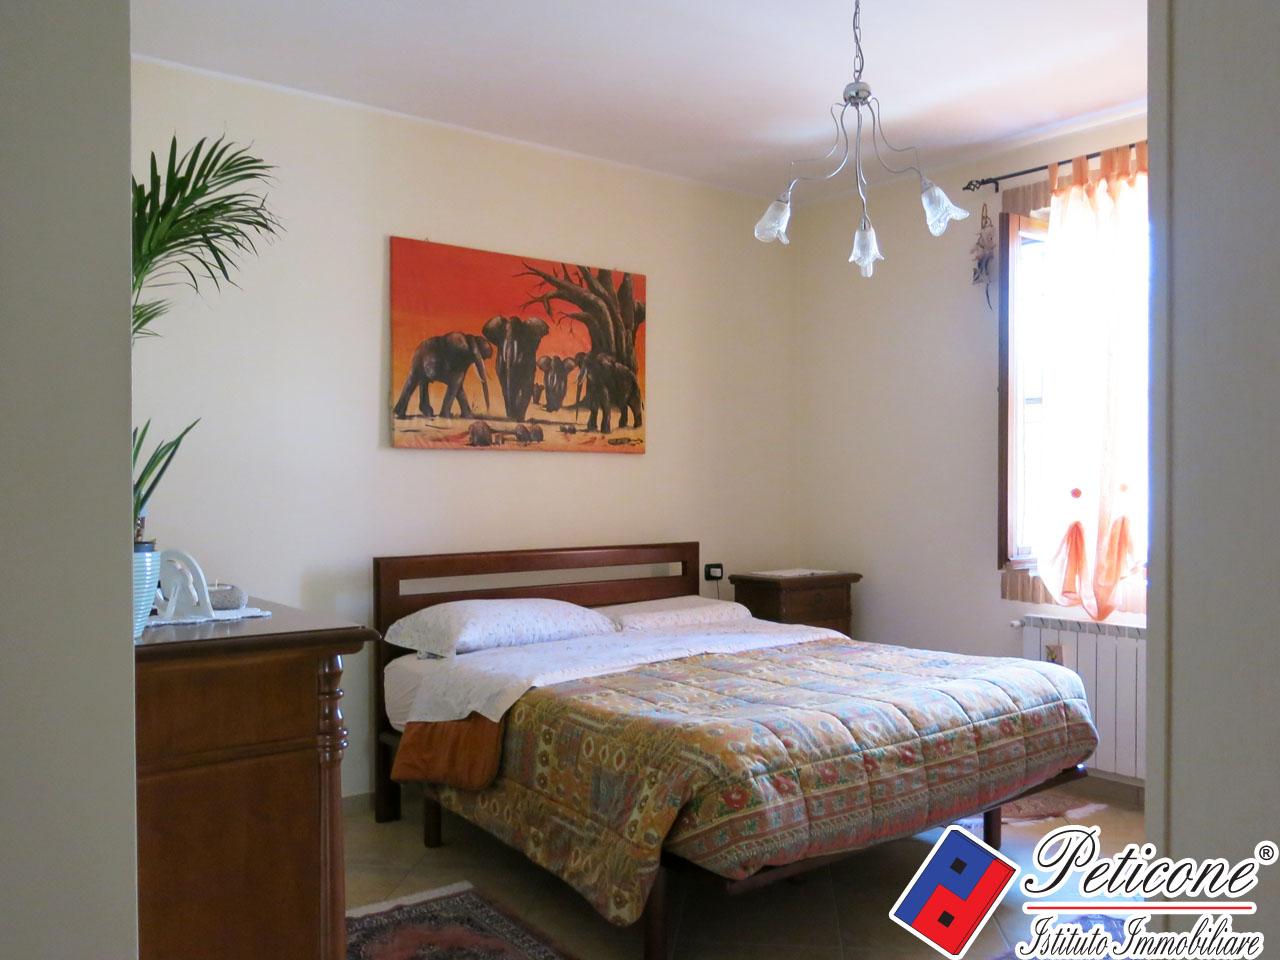 Villa in Vendita a Fondi: 3 locali, 107 mq - Foto 9